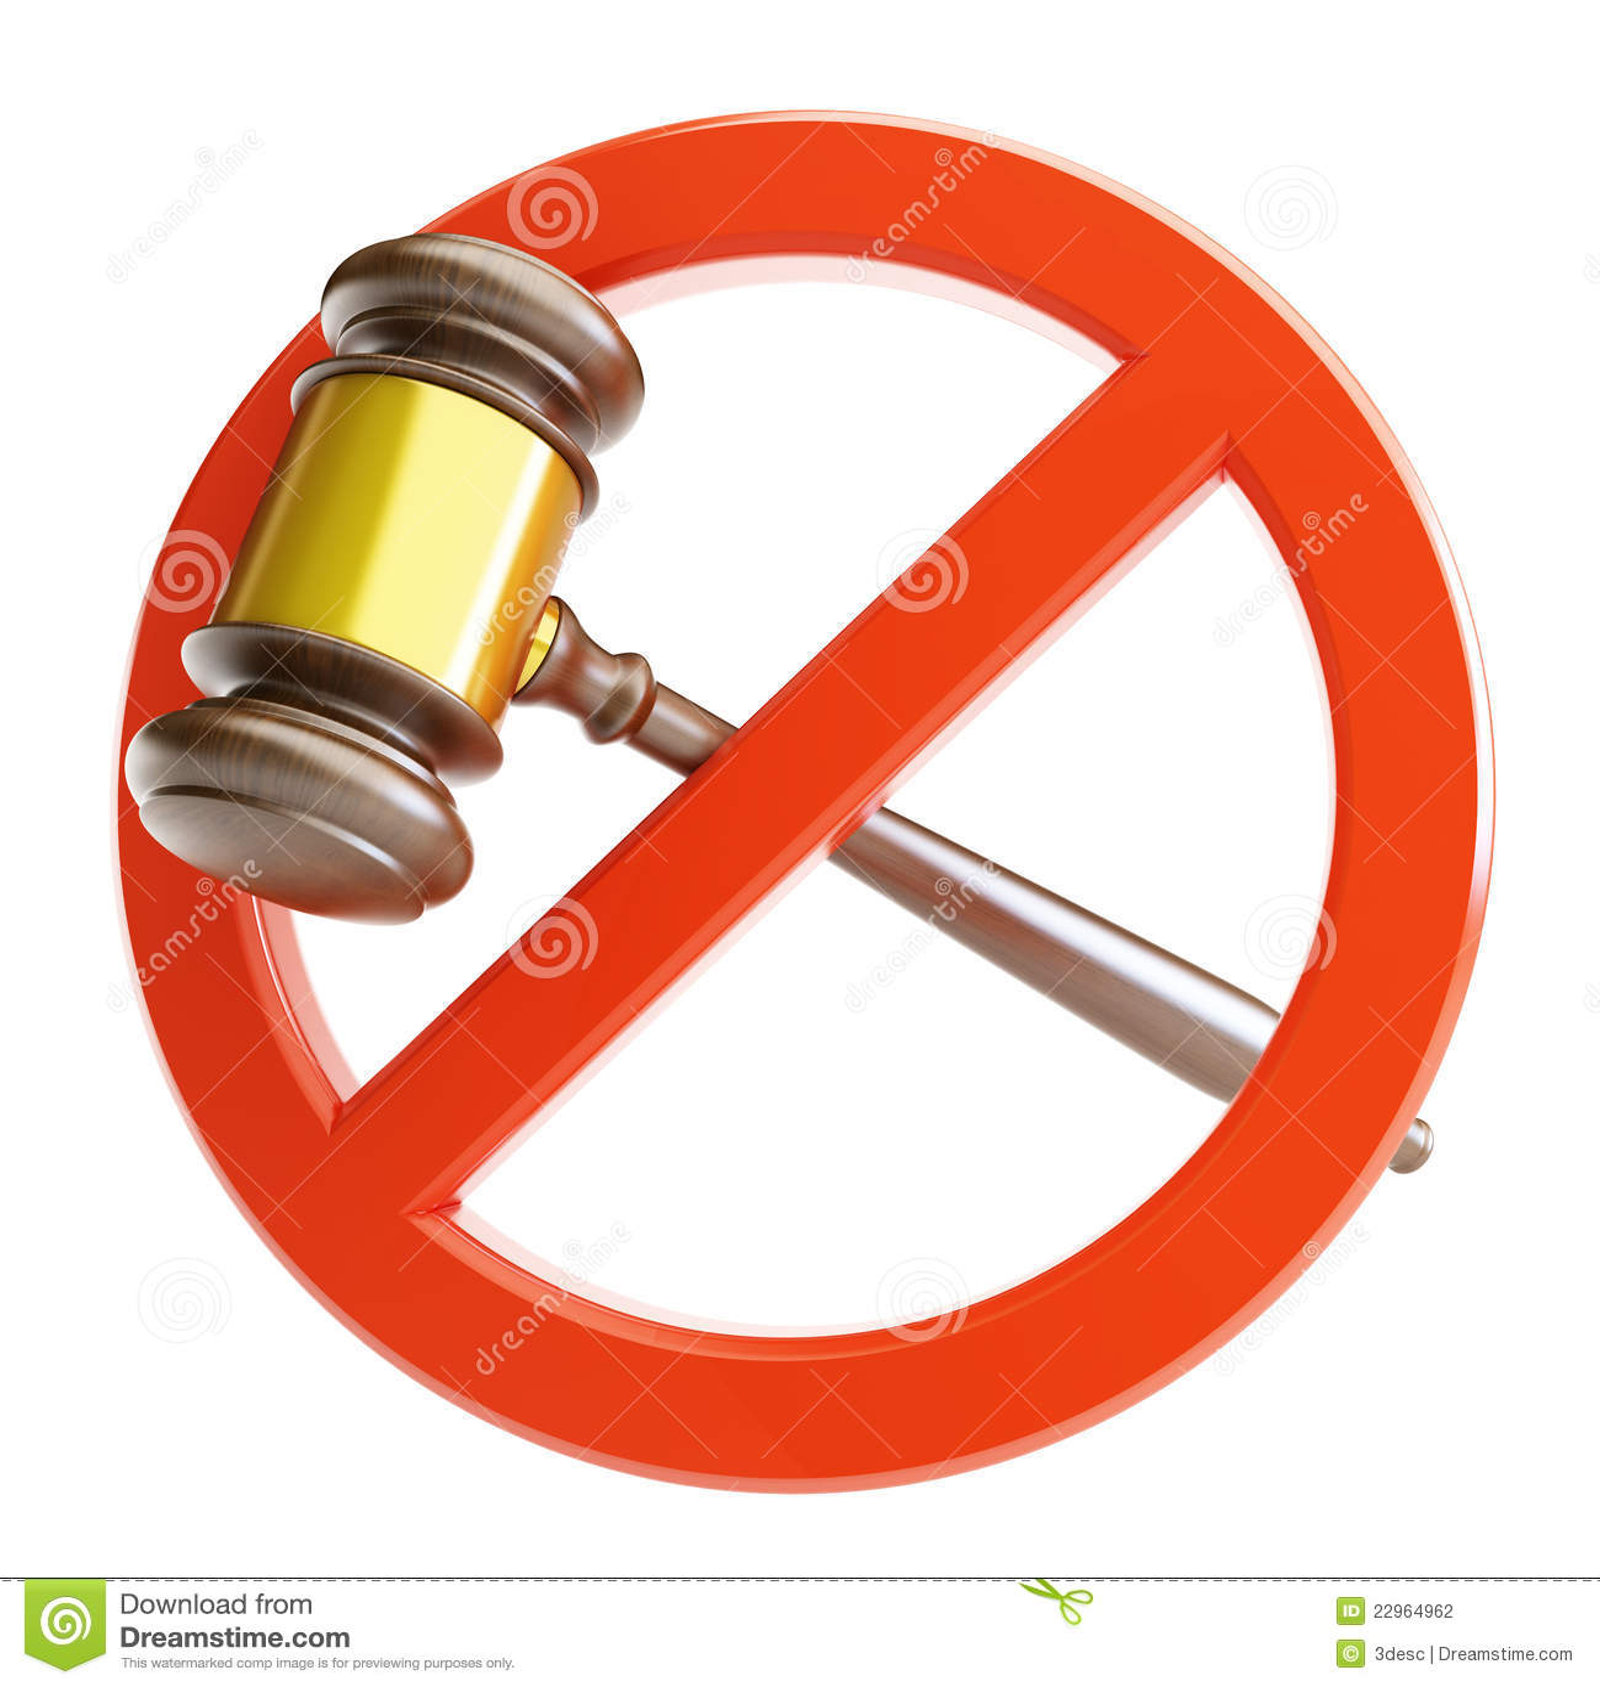 Hindu Divorce: A Legal